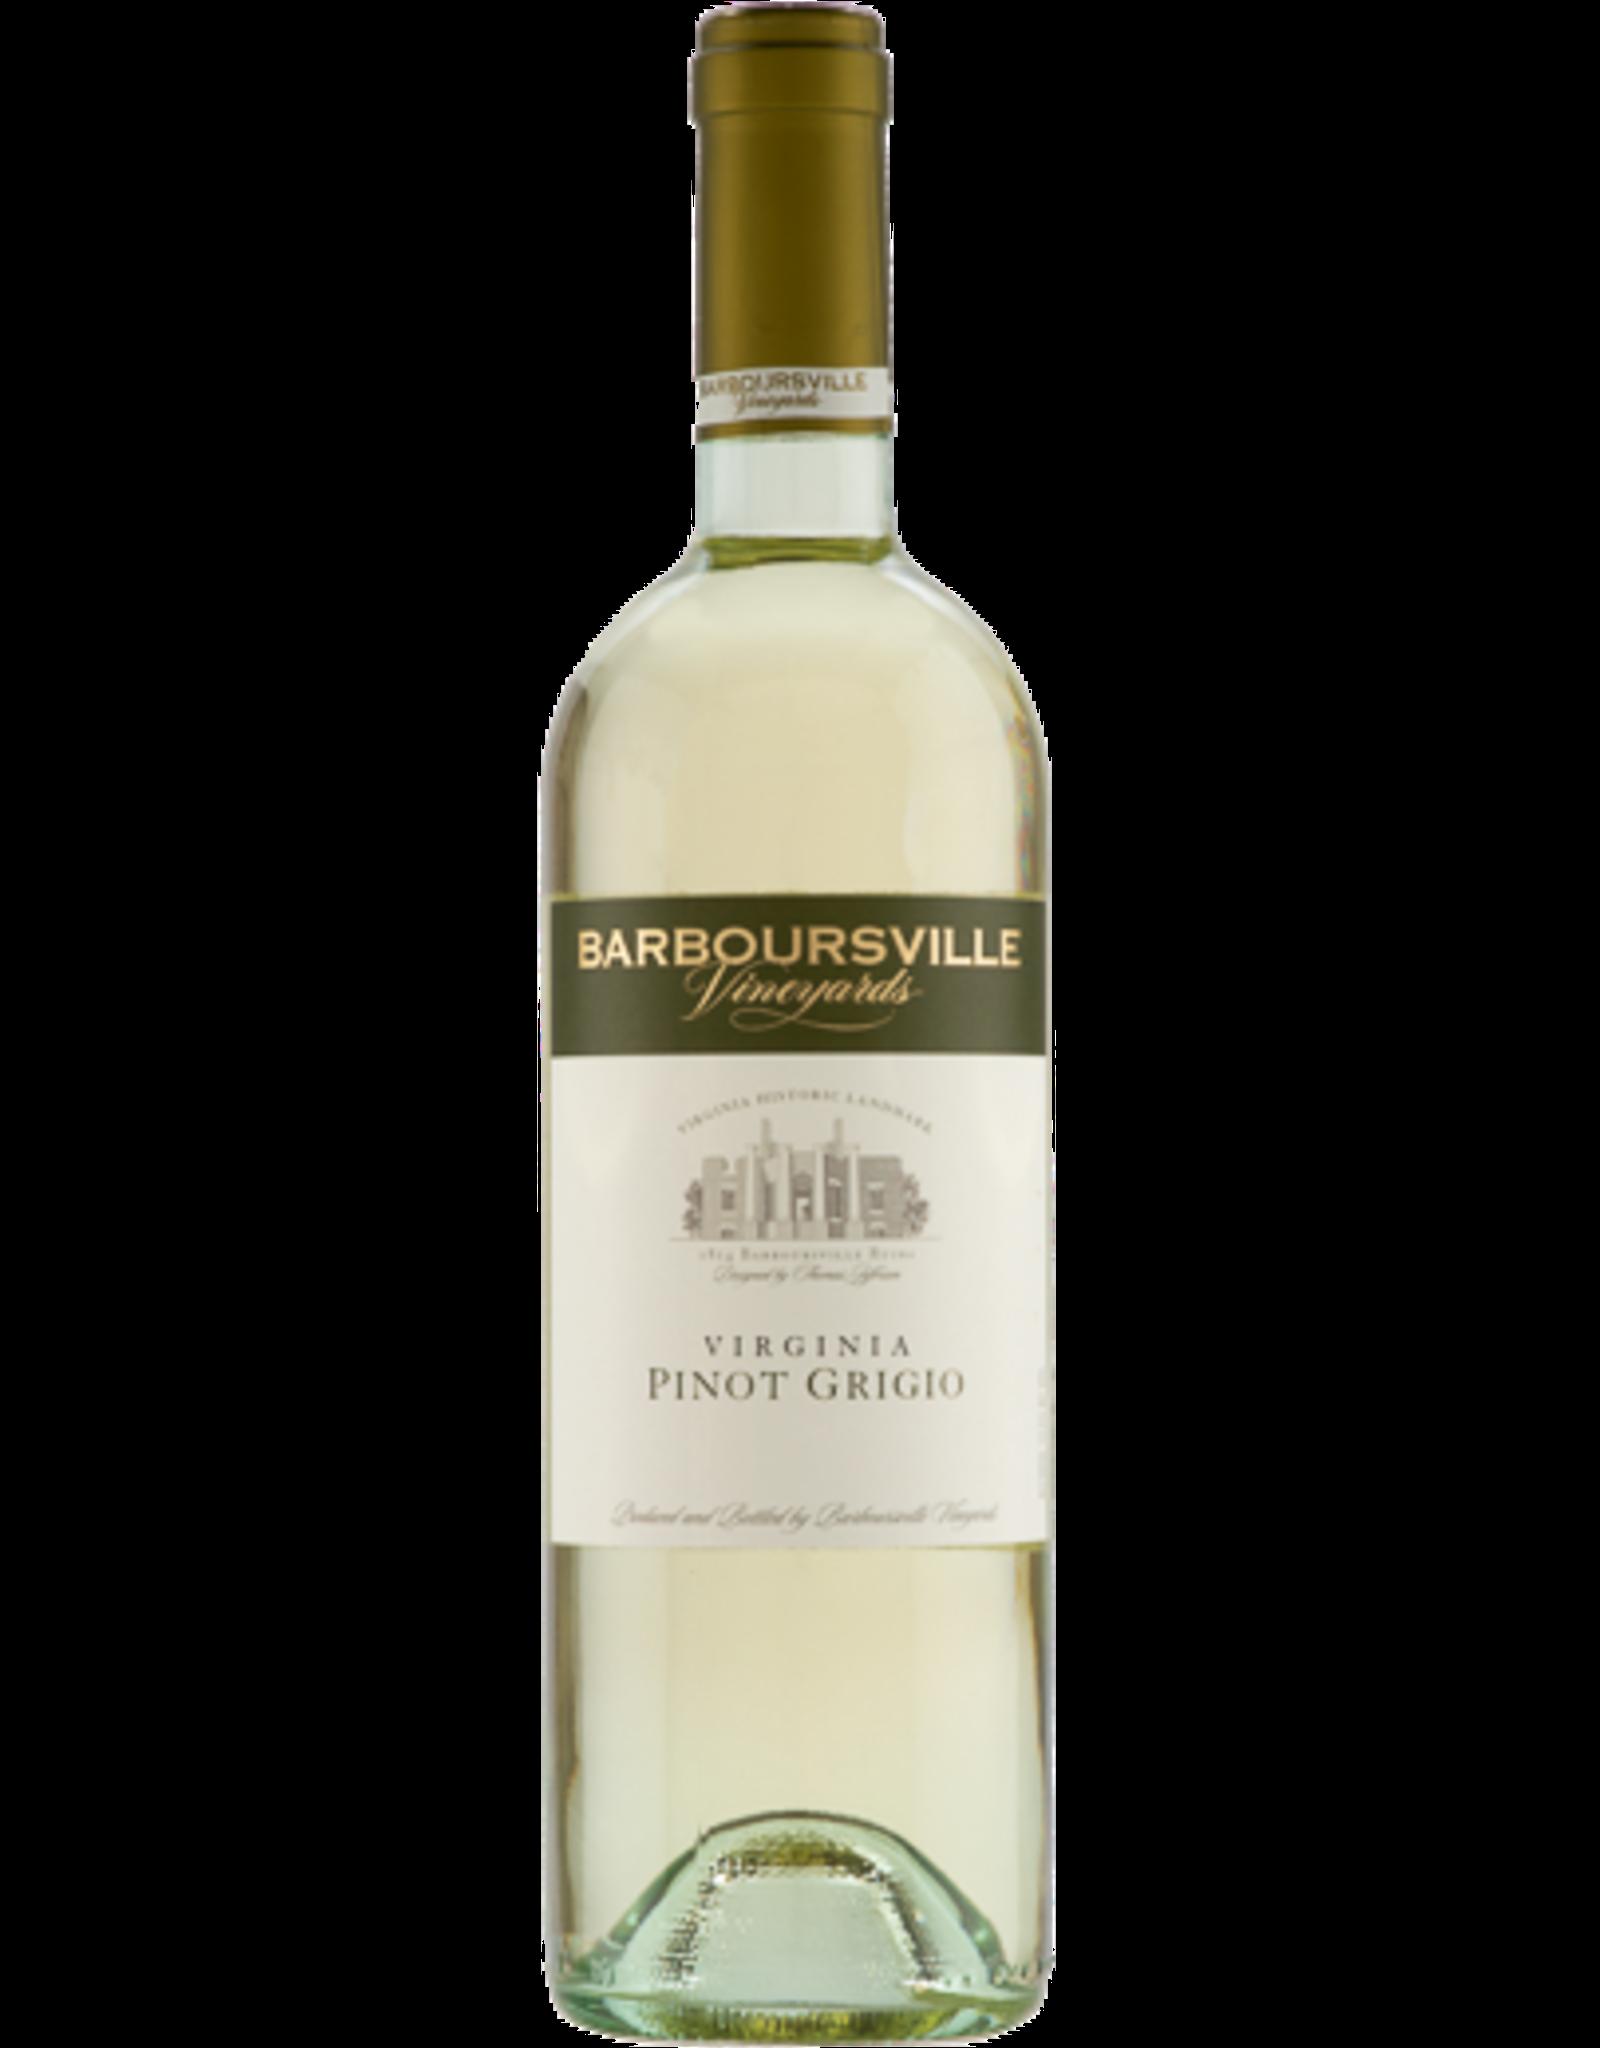 Barboursville Barboursville Pinot Grigio